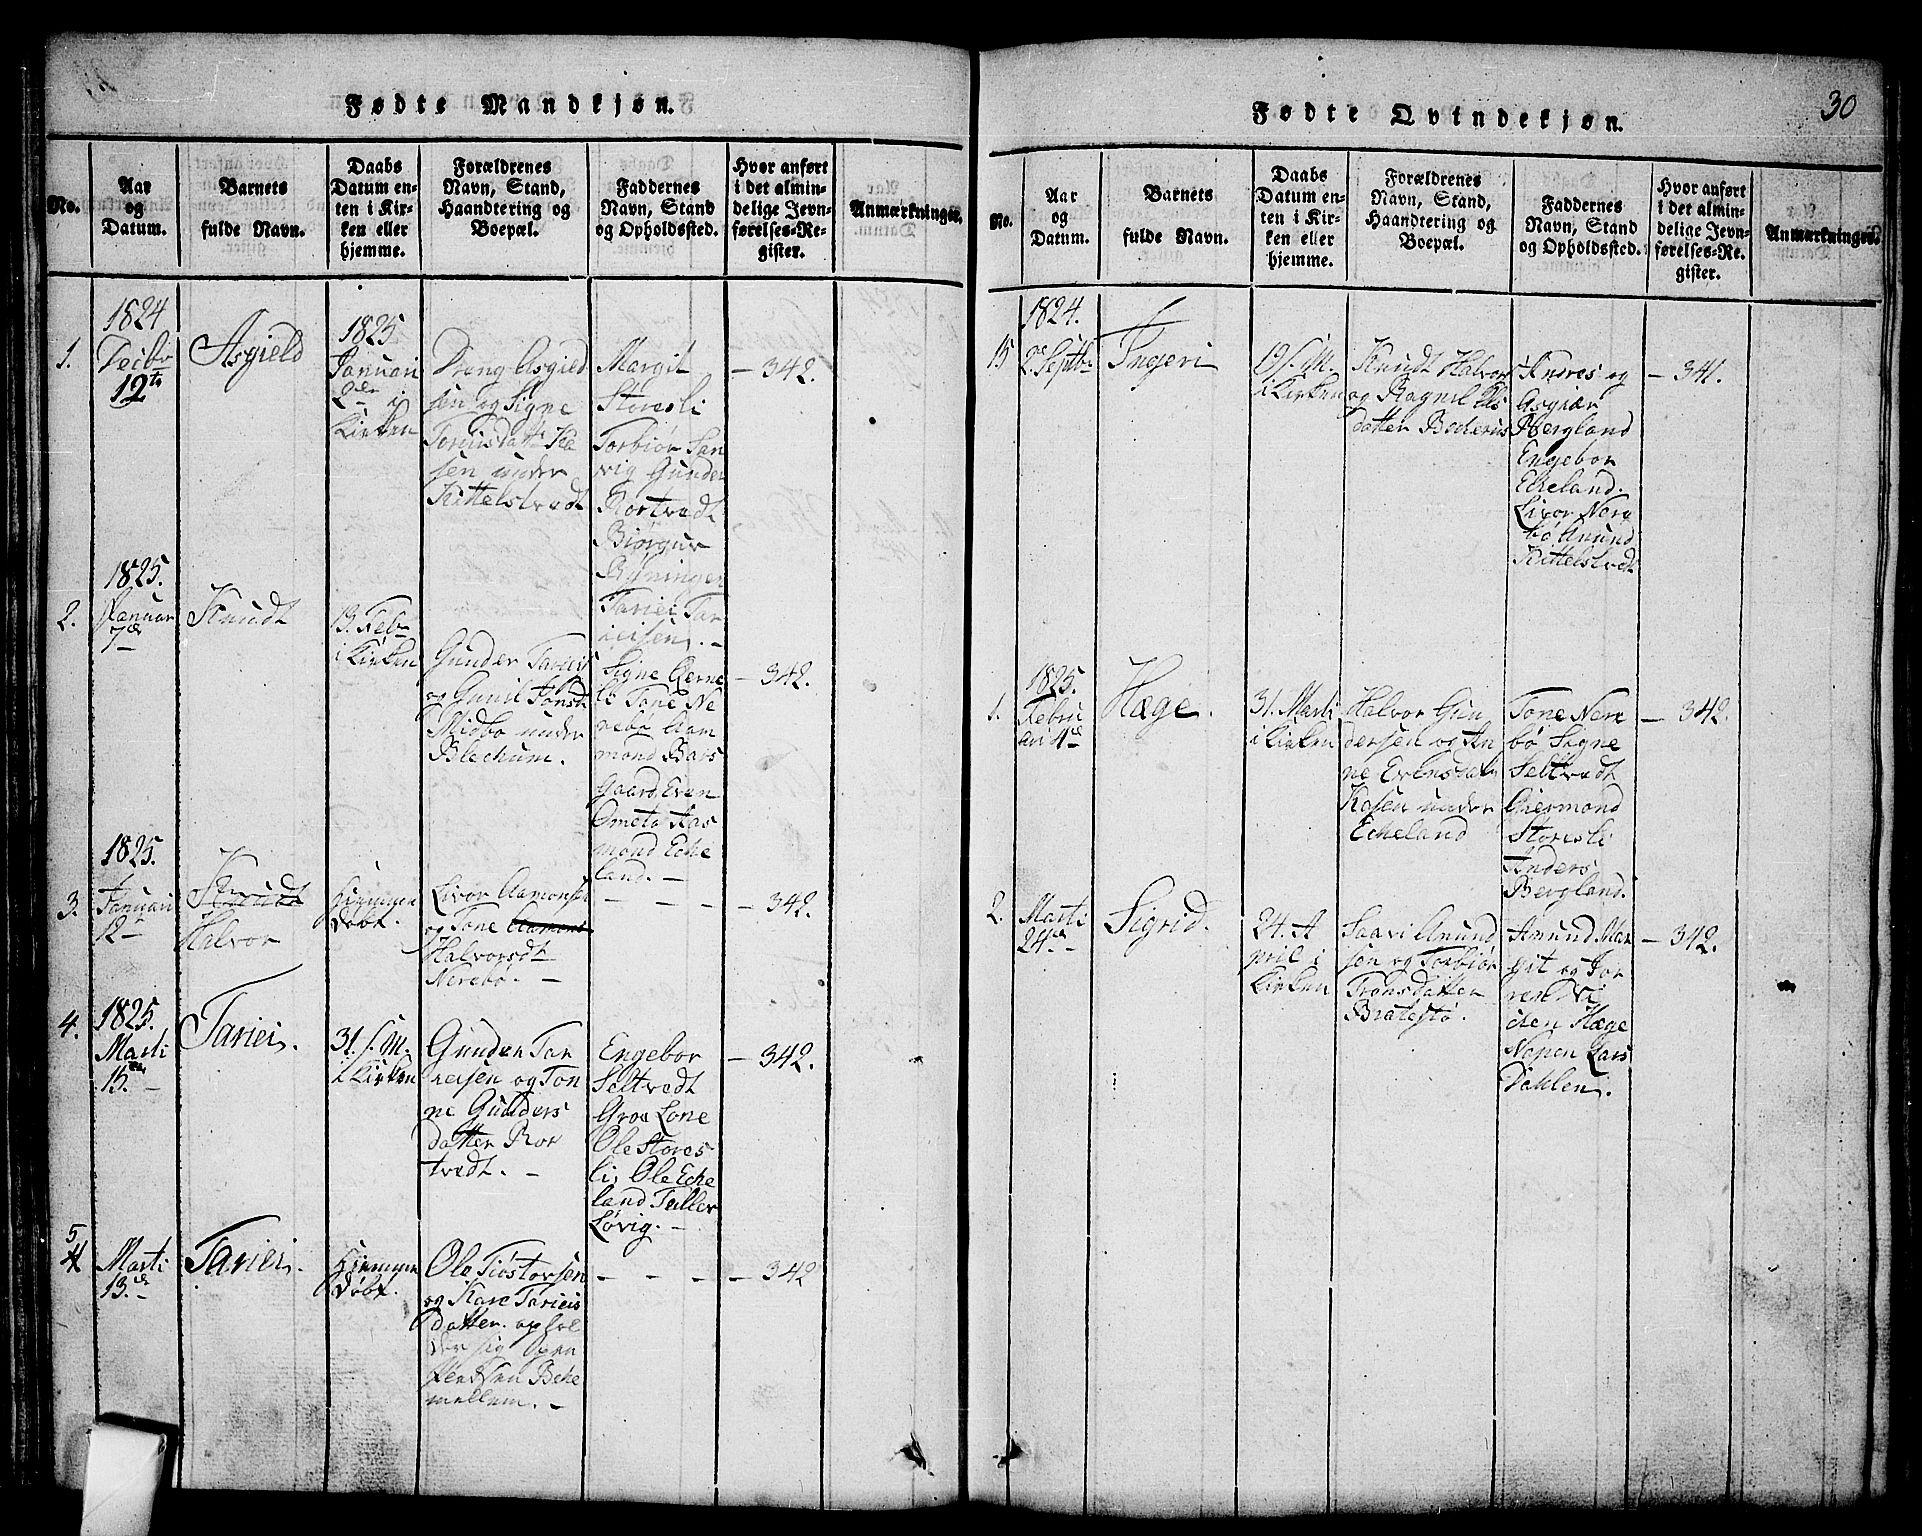 SAKO, Mo kirkebøker, G/Gb/L0001: Klokkerbok nr. II 1, 1814-1843, s. 30